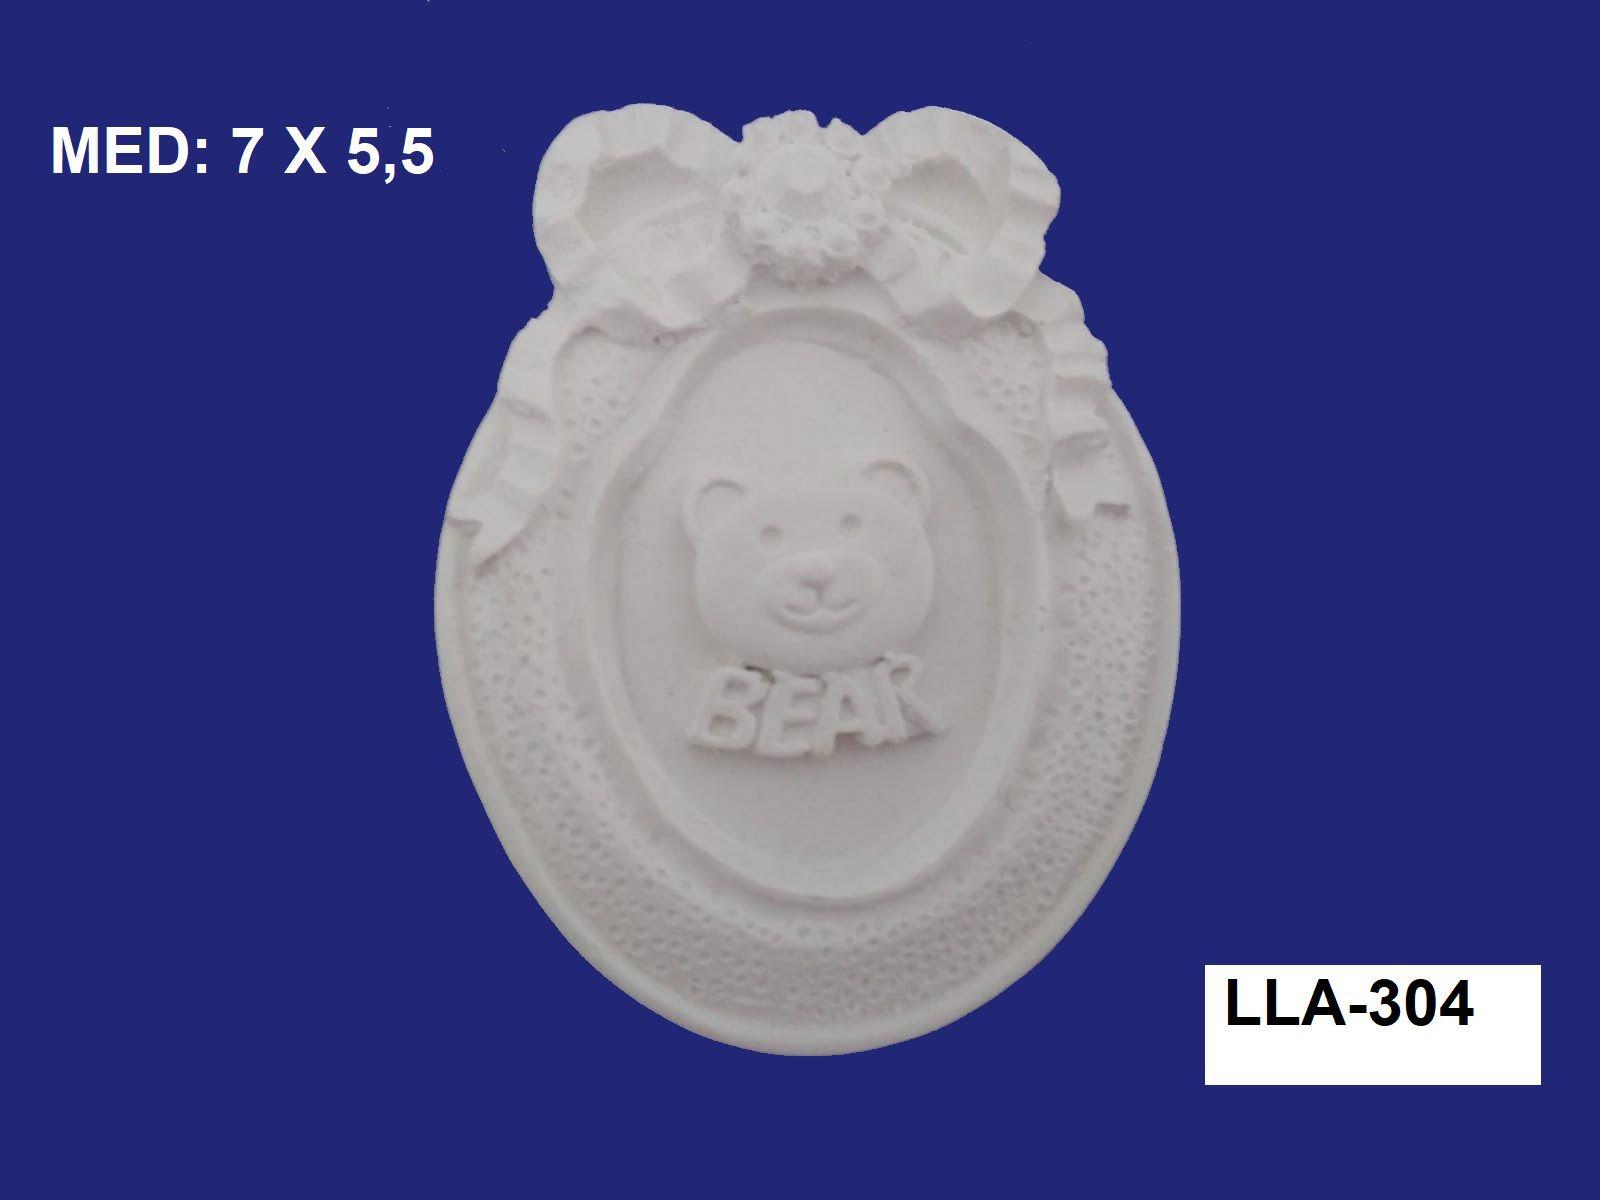 LLA-304 APLIQUE URSO NA MOLDURA 7X5,5CM